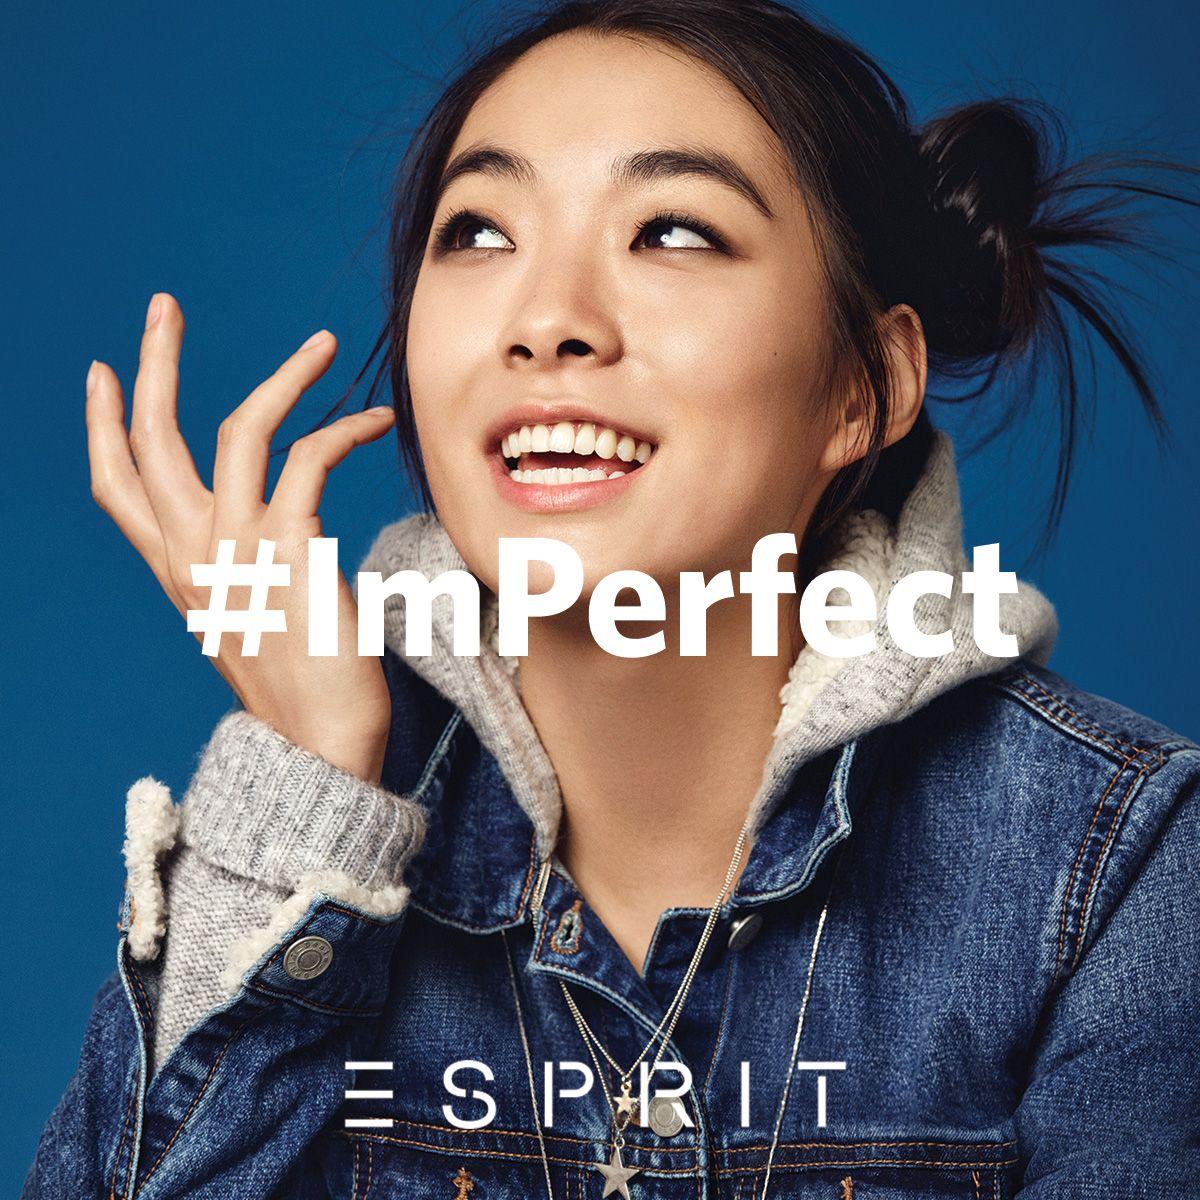 I create my own magic. #ImPerfect